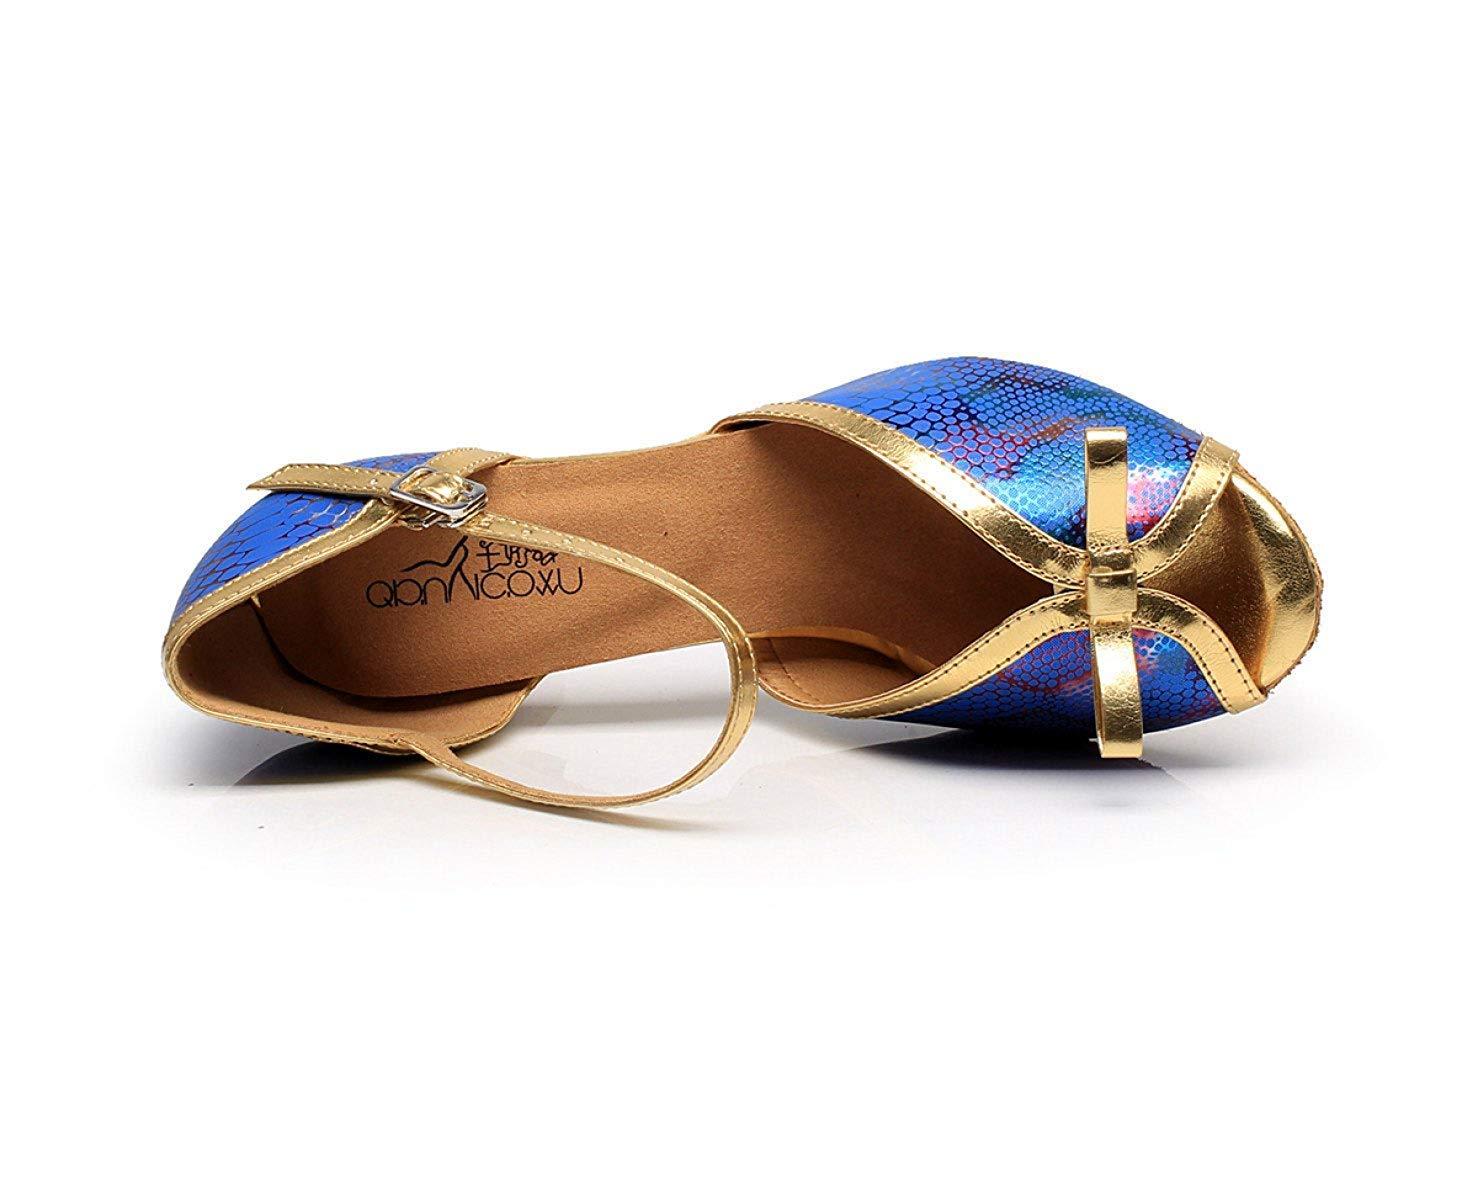 Lateinamerikanische Tanzschuhe für Damen Salsa Tango Chacha Samba Samba Samba Modern Jazz Schuhe Sandalen High Heels Blau-Absatz7.5cm-UK5.5   EU38   Our39 60f129